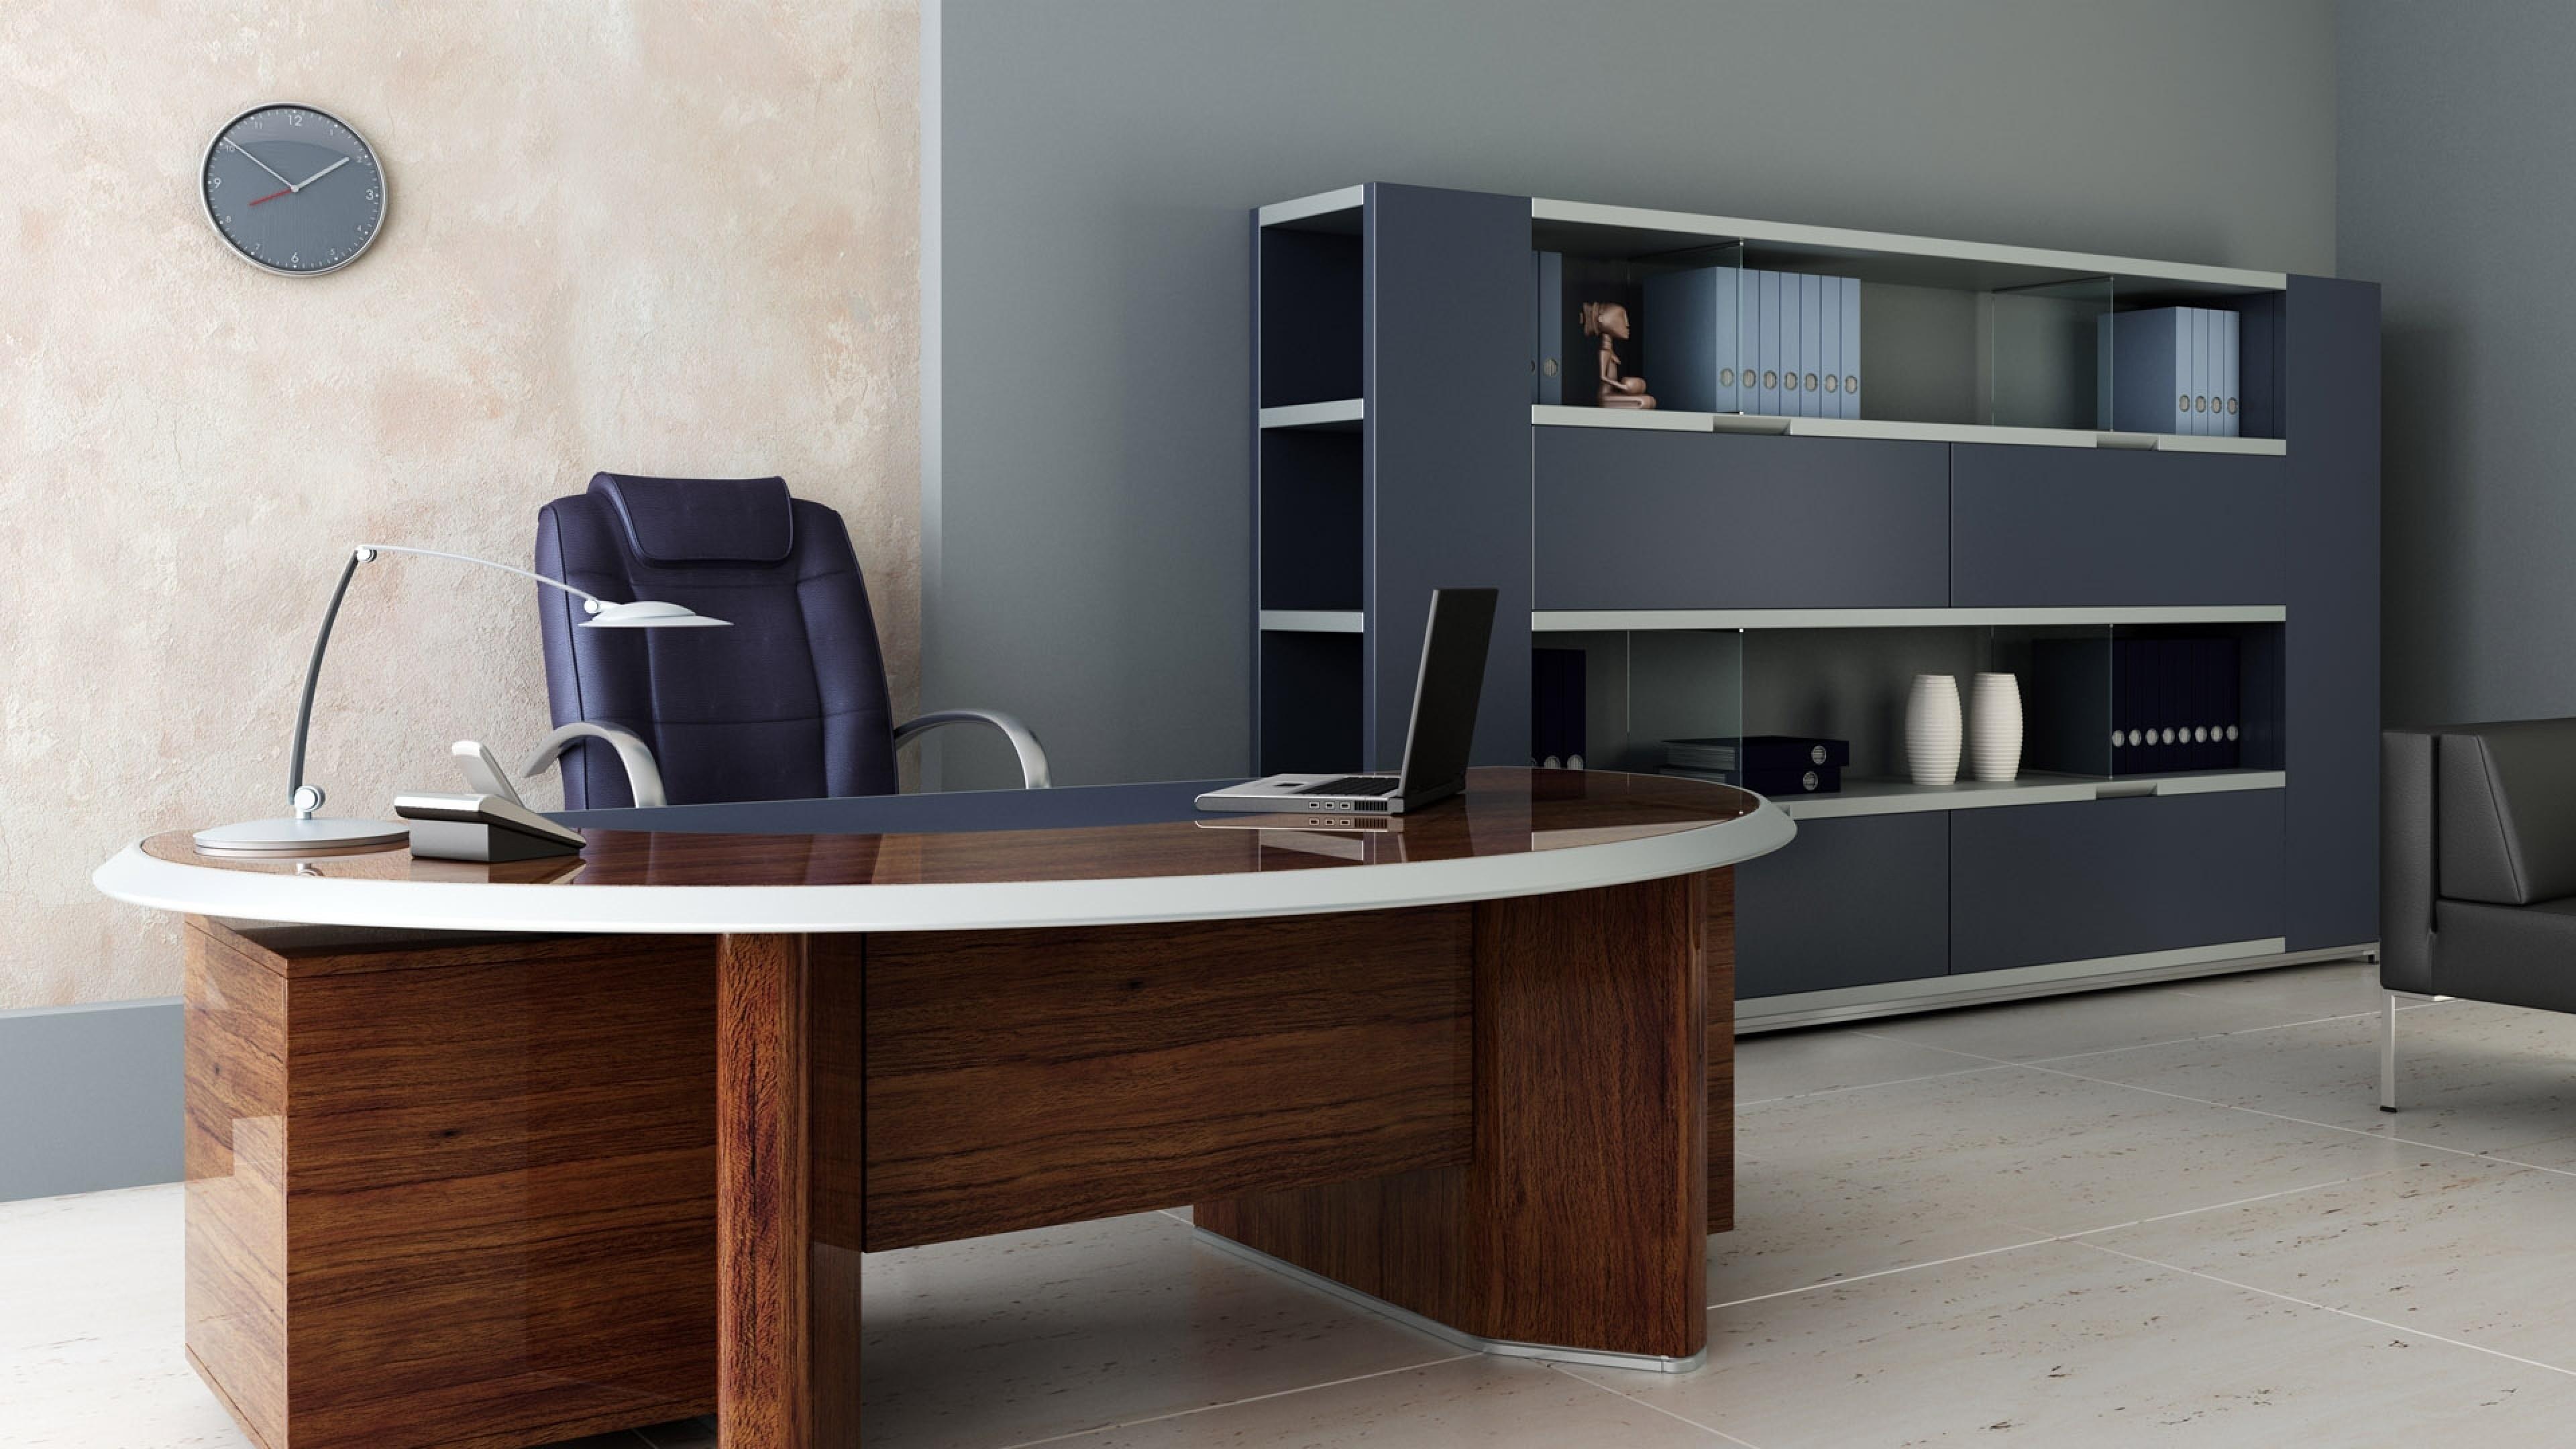 3840x2160 3840x2160 Wallpaper Room, Office, Desk, Chair, Shelves